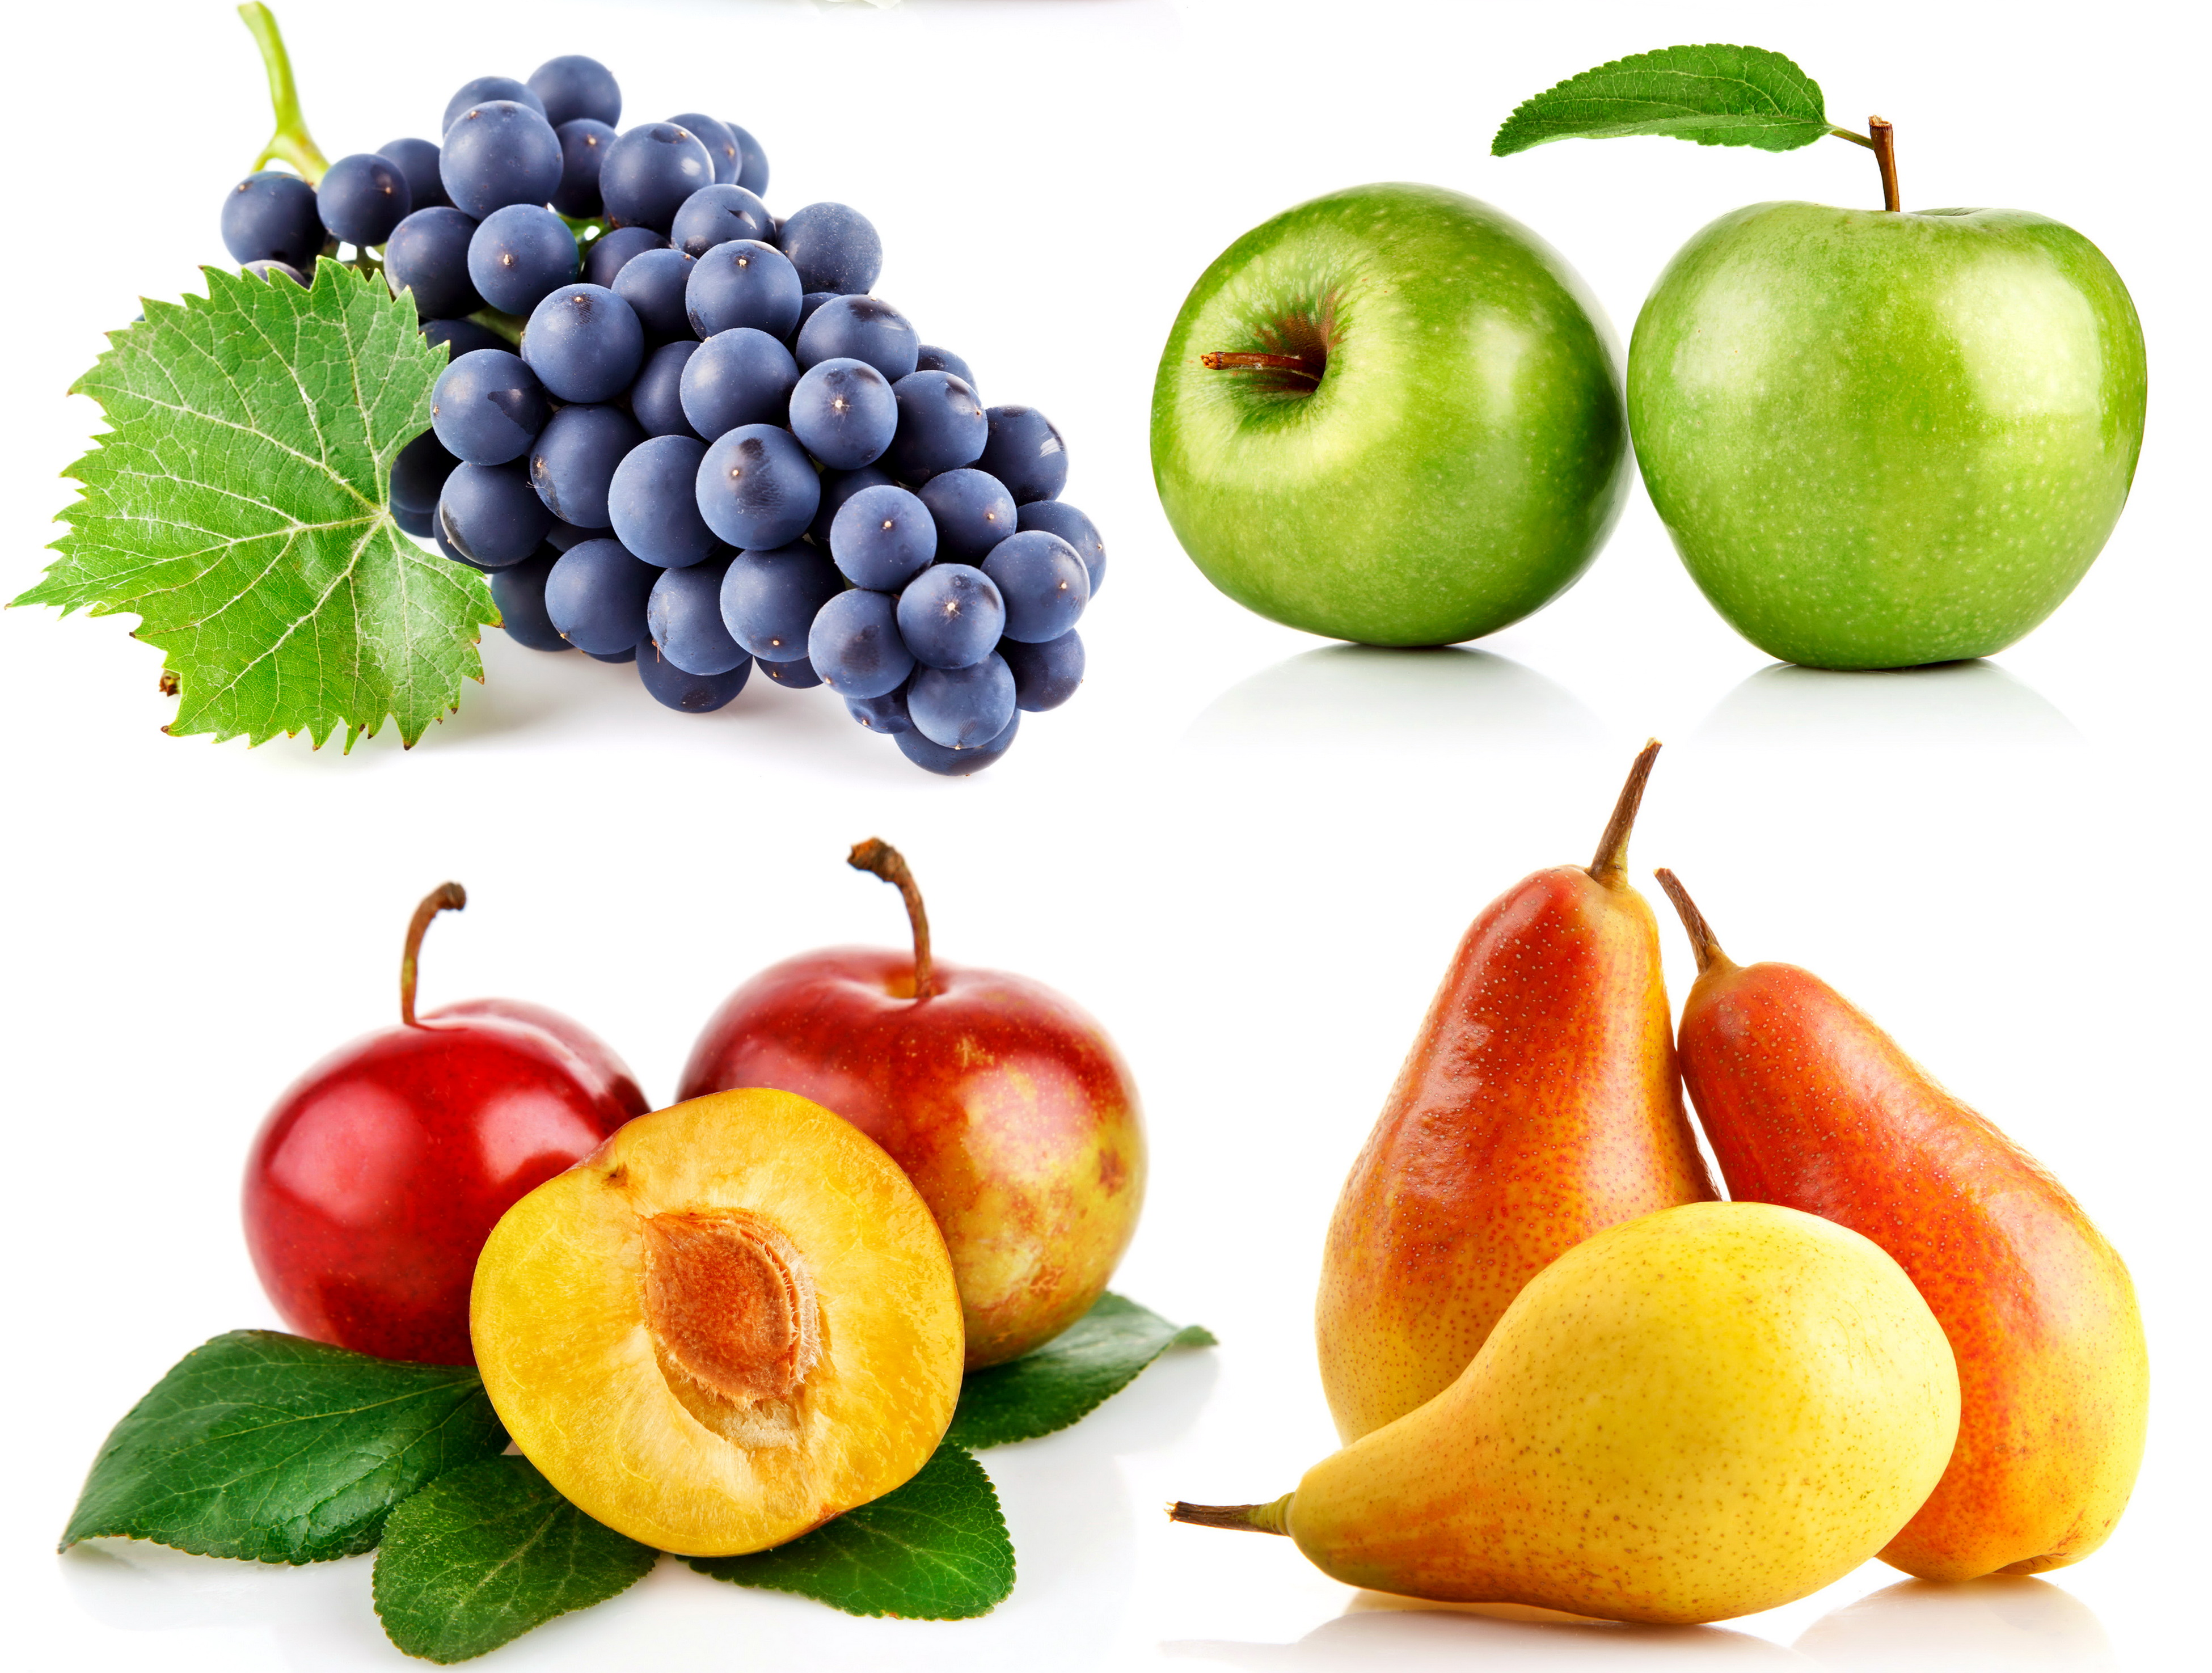 Food   Fruit Wallpaper 3900x2950